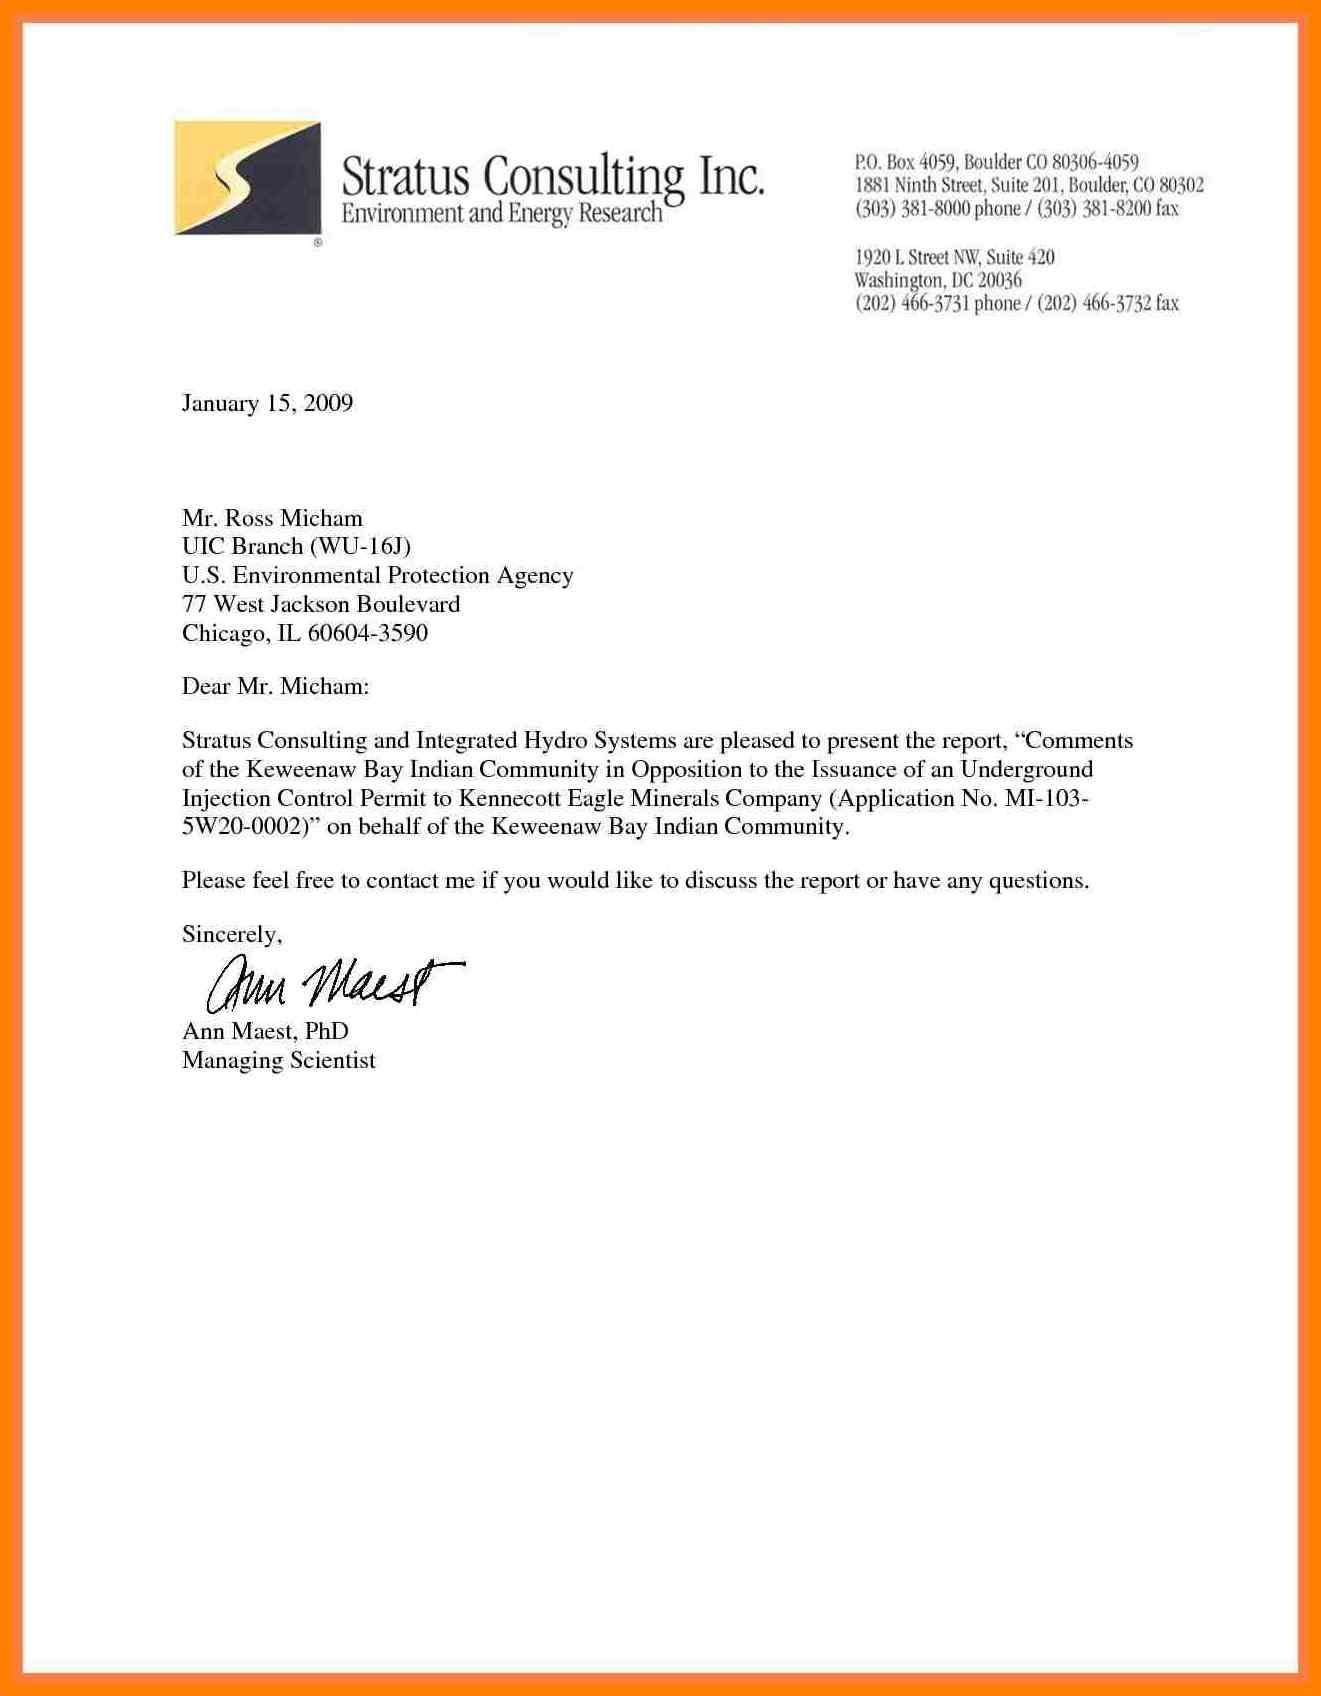 business letterhead format business